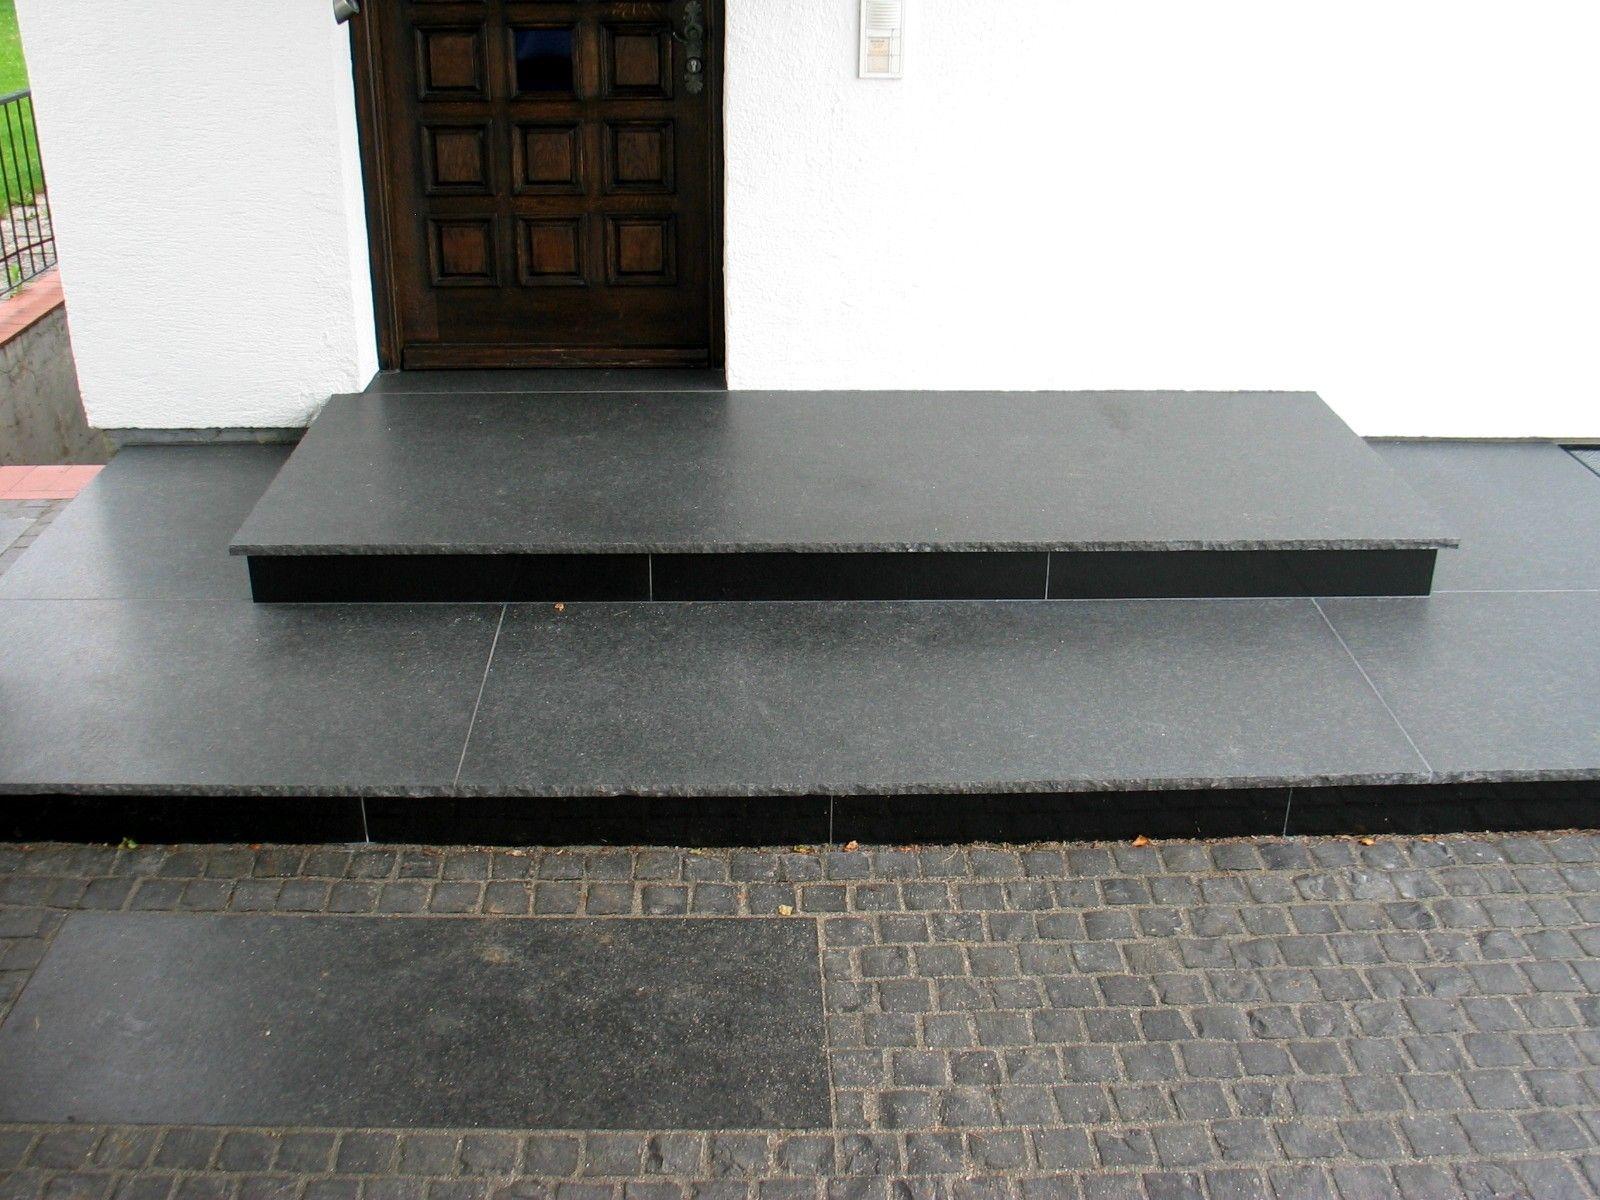 hauseingang eingangspodest gartenentw rfe pinterest. Black Bedroom Furniture Sets. Home Design Ideas